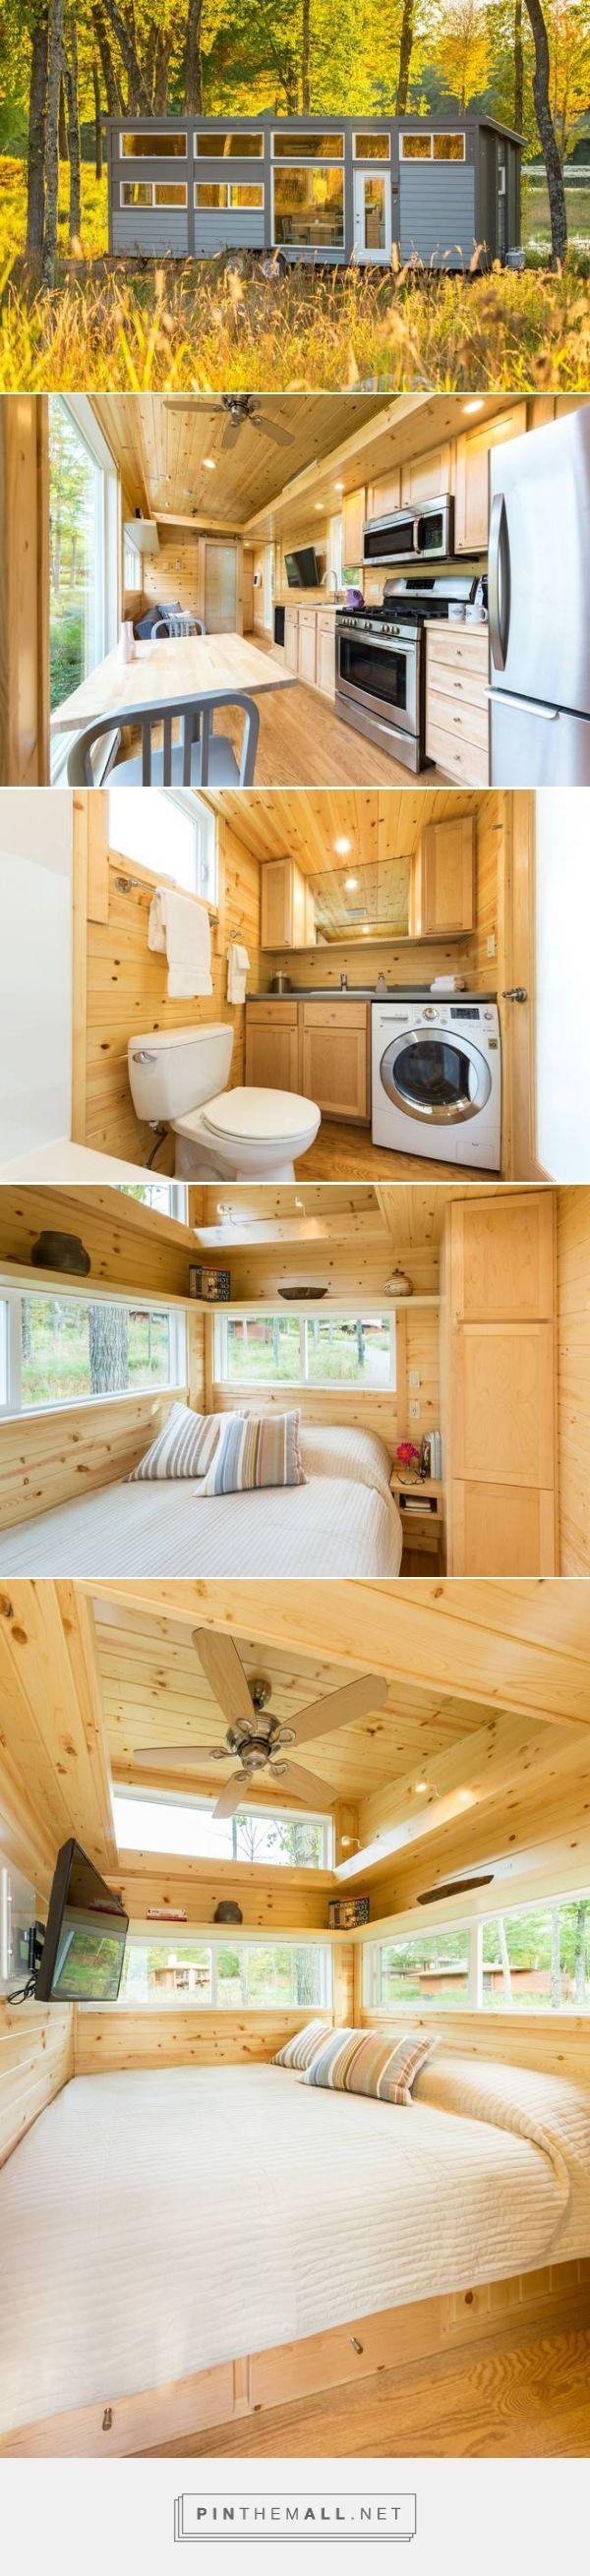 Astounding 105 Impressive Tiny Houses That Maximize Function and Style https://decoratio.co/2017/03/105-impressive-tiny-houses-maximize-function-style/